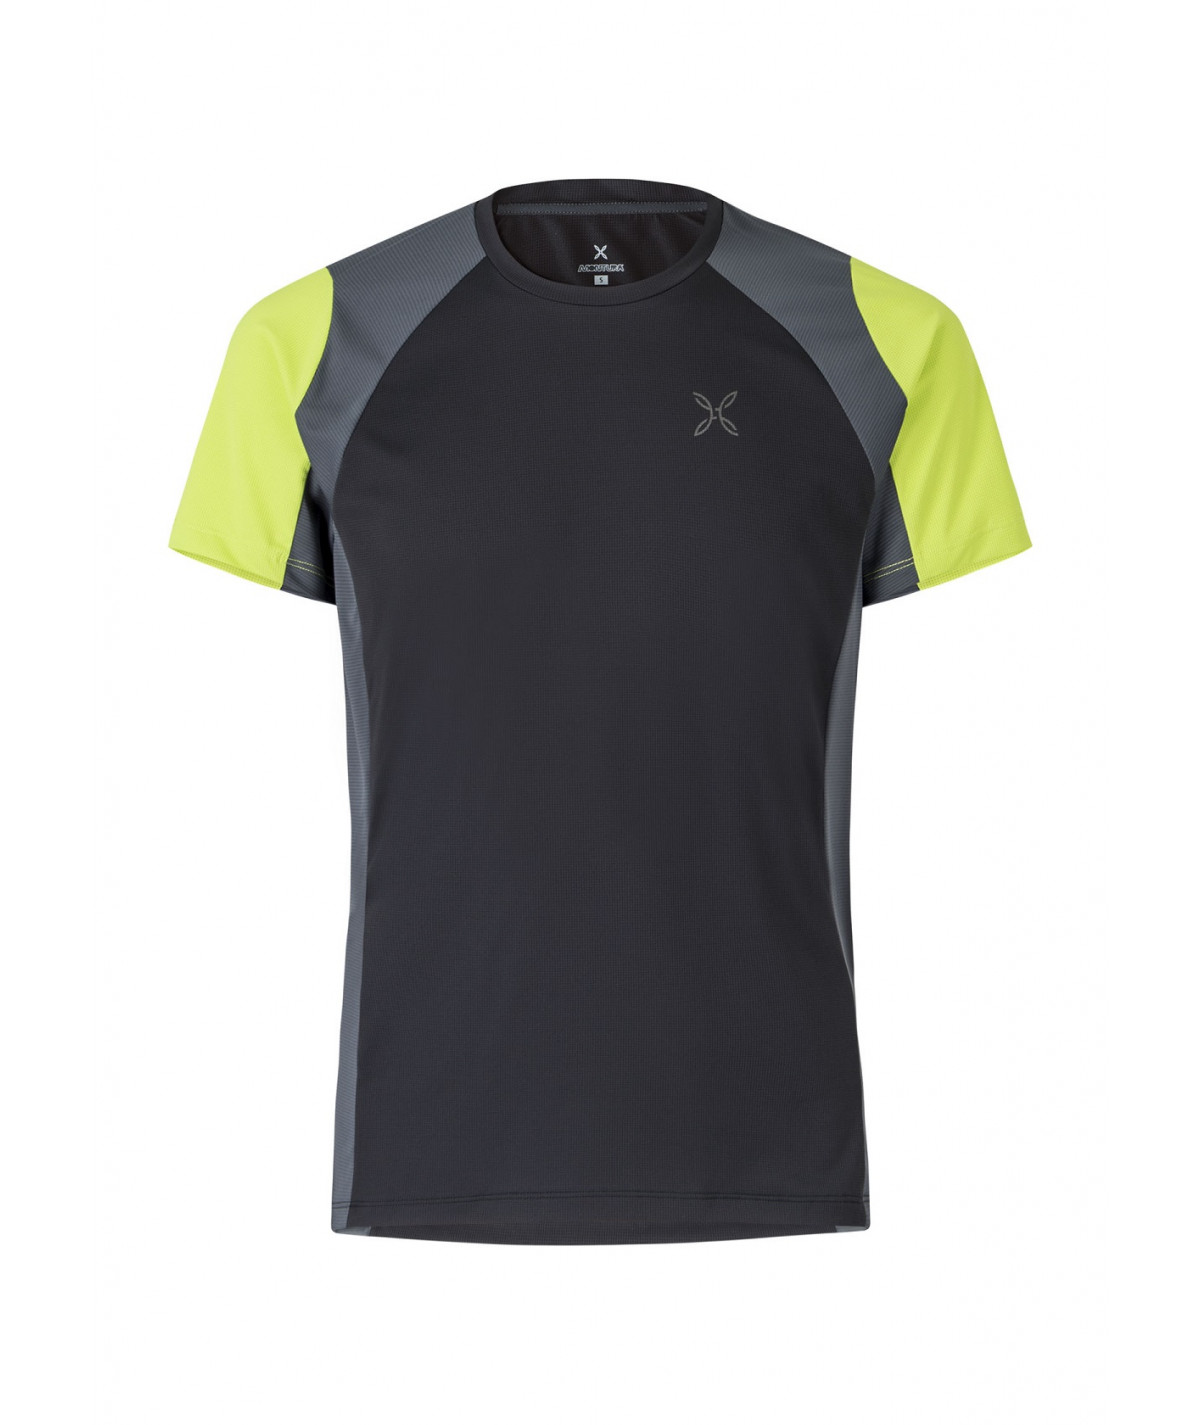 Montura Choice T-Shirt